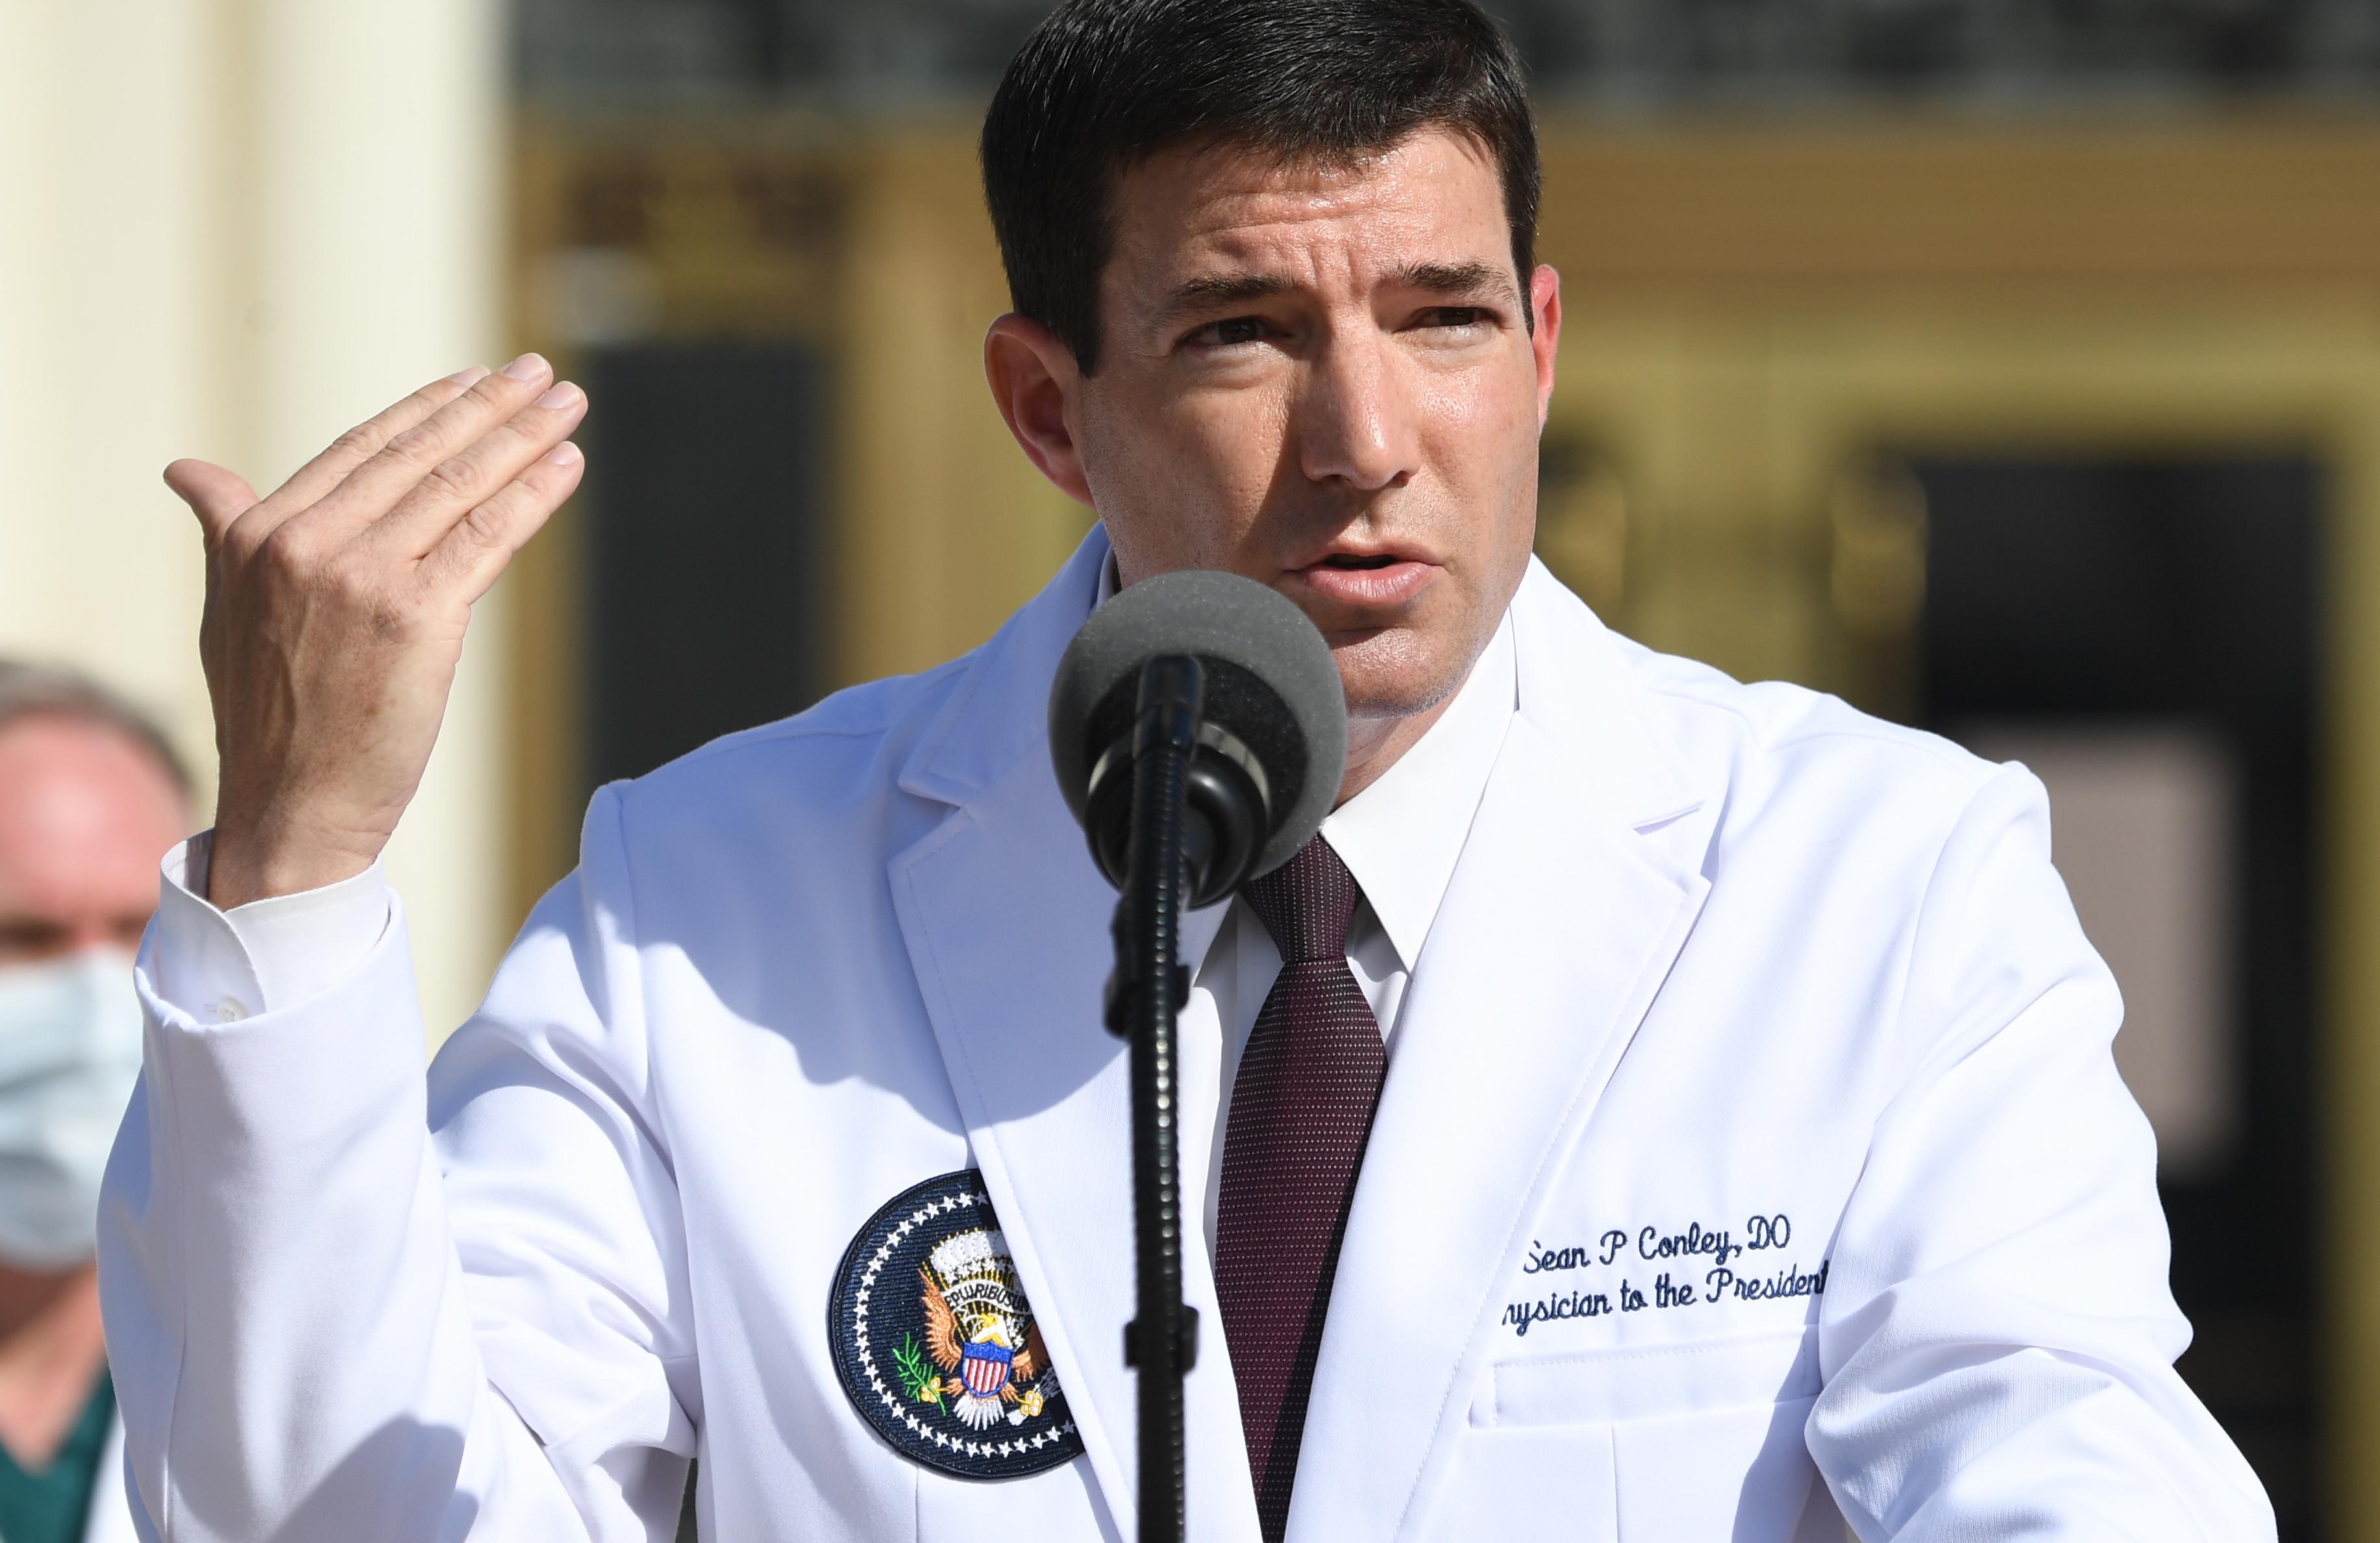 Een foto van Sean Conley, de arts van Trump